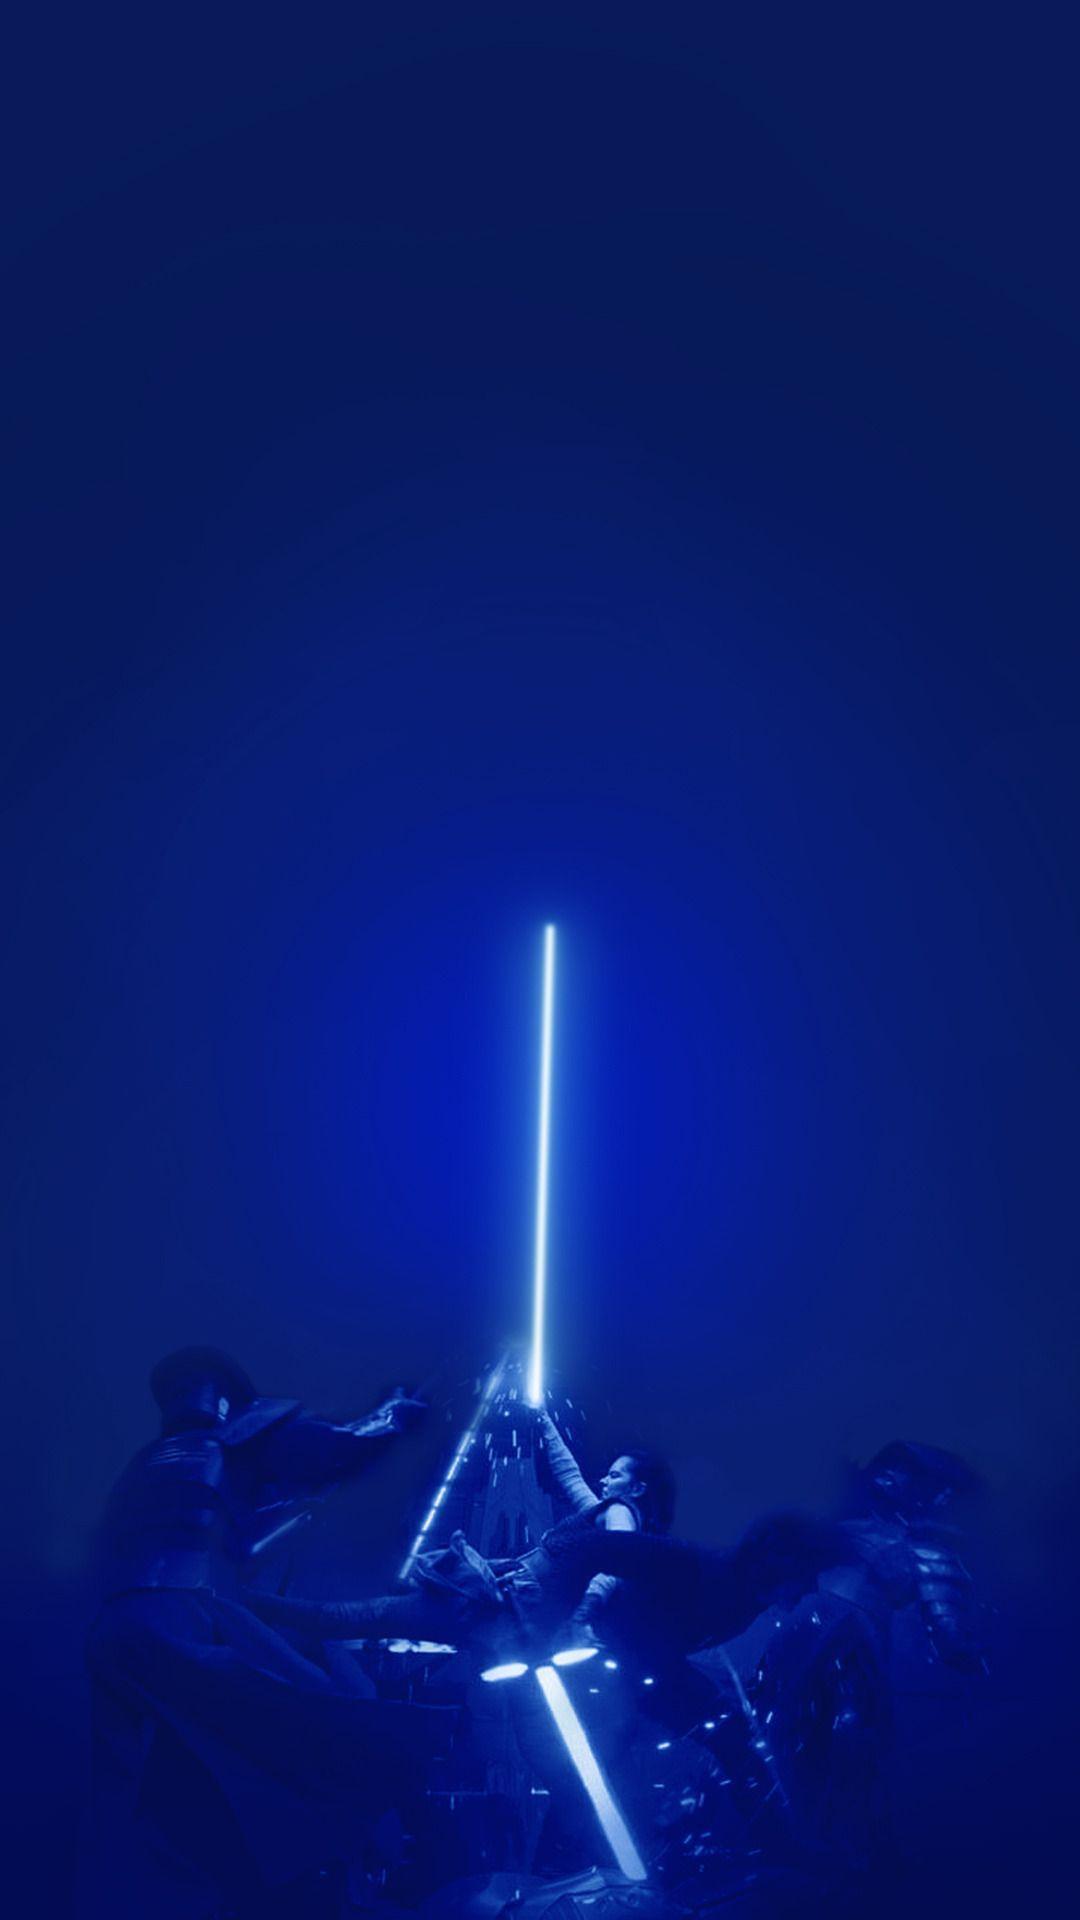 Visit Jedi Star Wars Wallpaper Android On High Definition Wallpaper At Rainbowwallpaper Info Pin If You In 2020 Star Wars Wallpaper Star Wars Background Star Wars Art